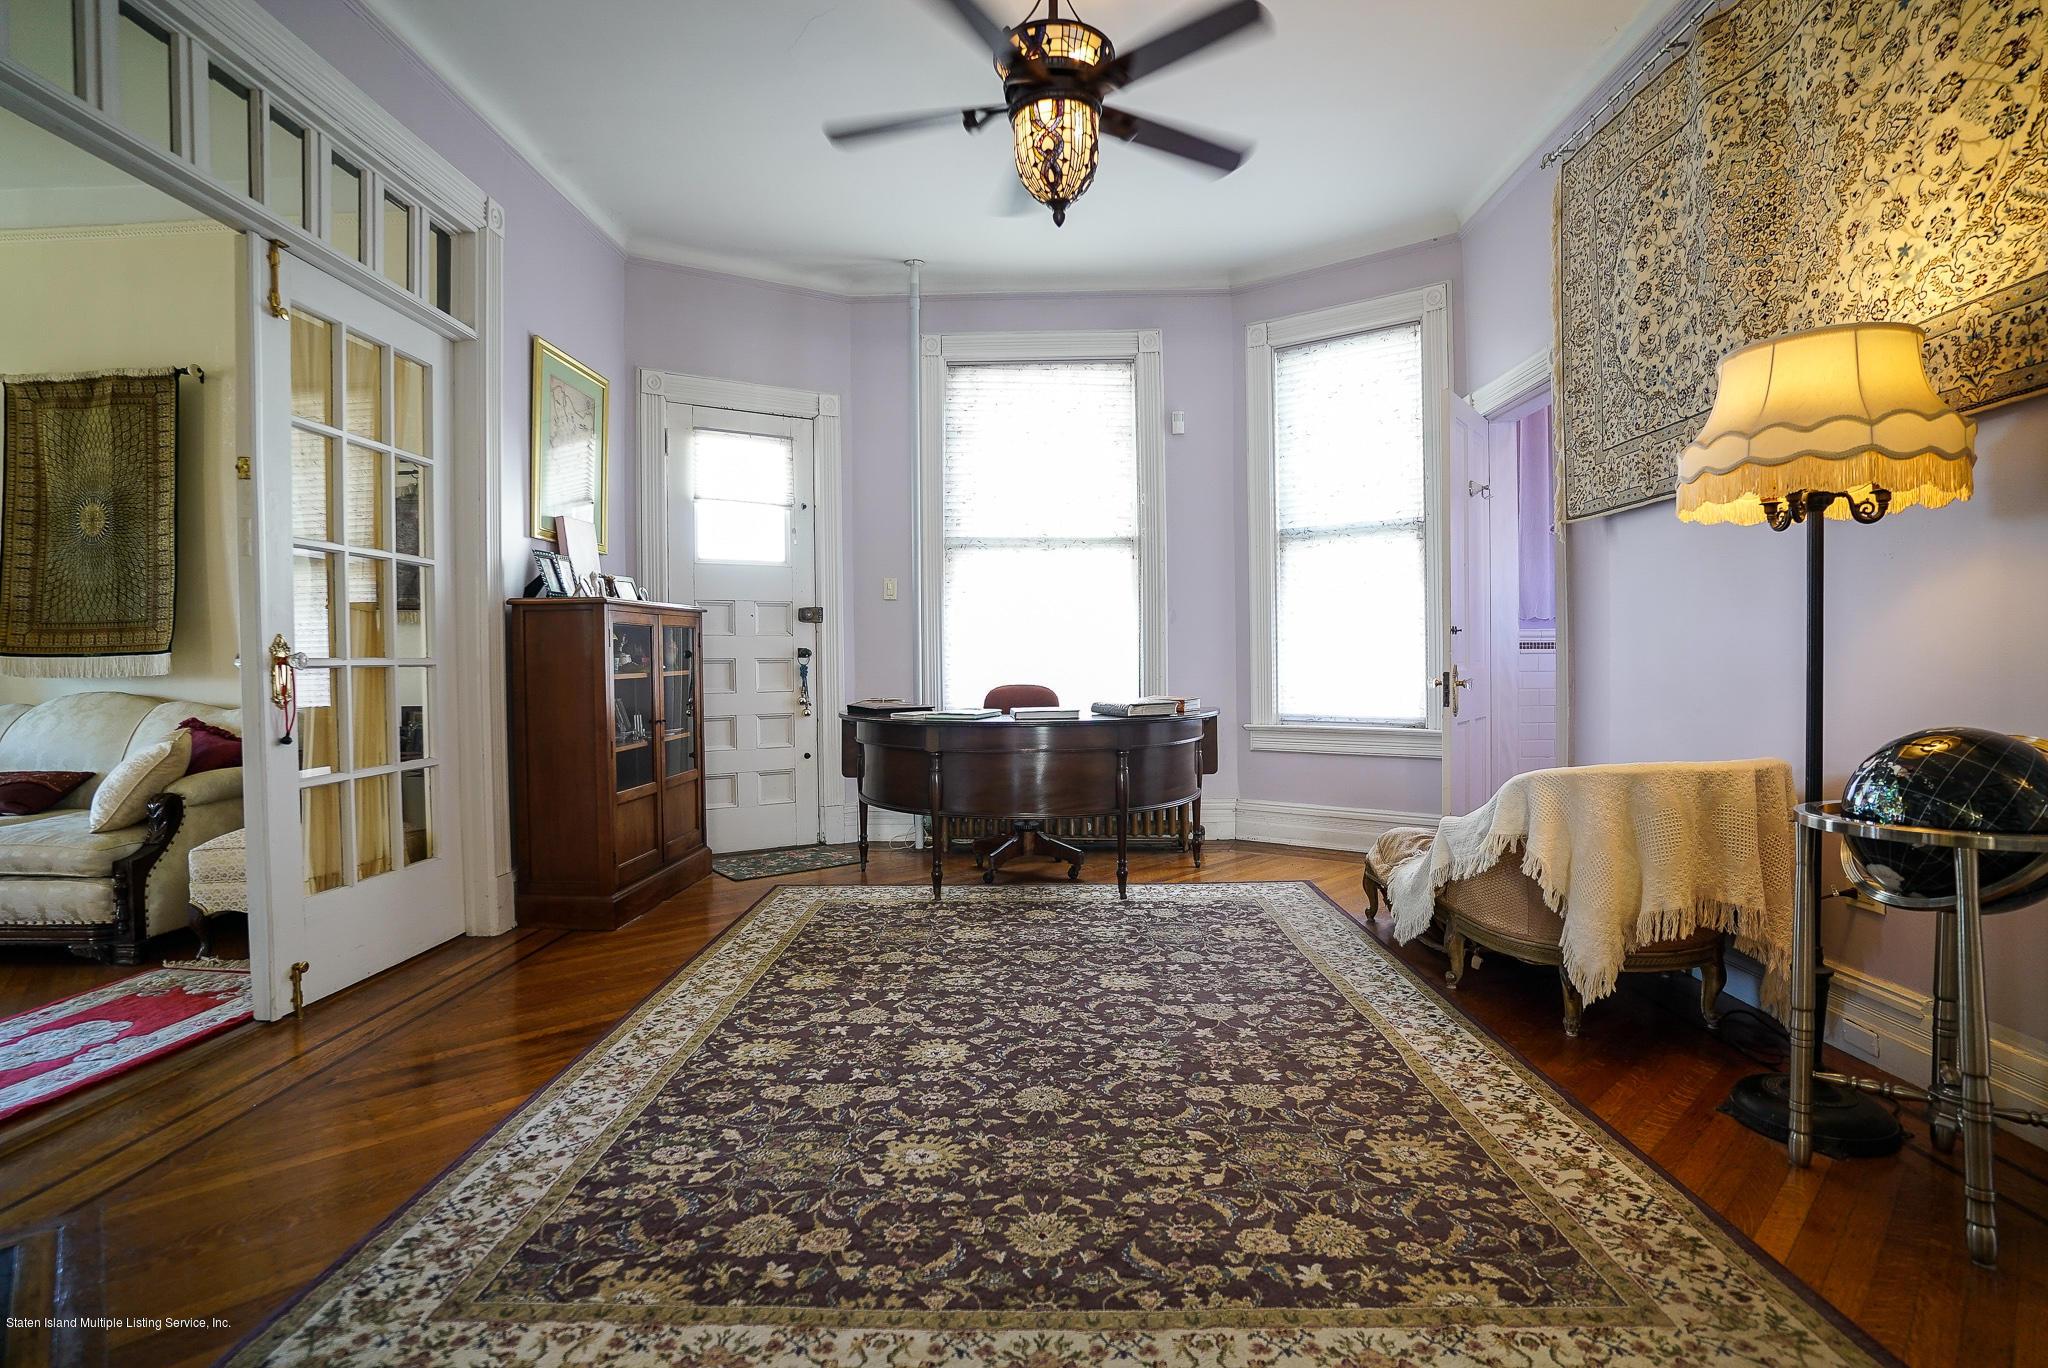 Single Family - Detached 309 Guyon Avenue  Staten Island, NY 10306, MLS-1142302-9